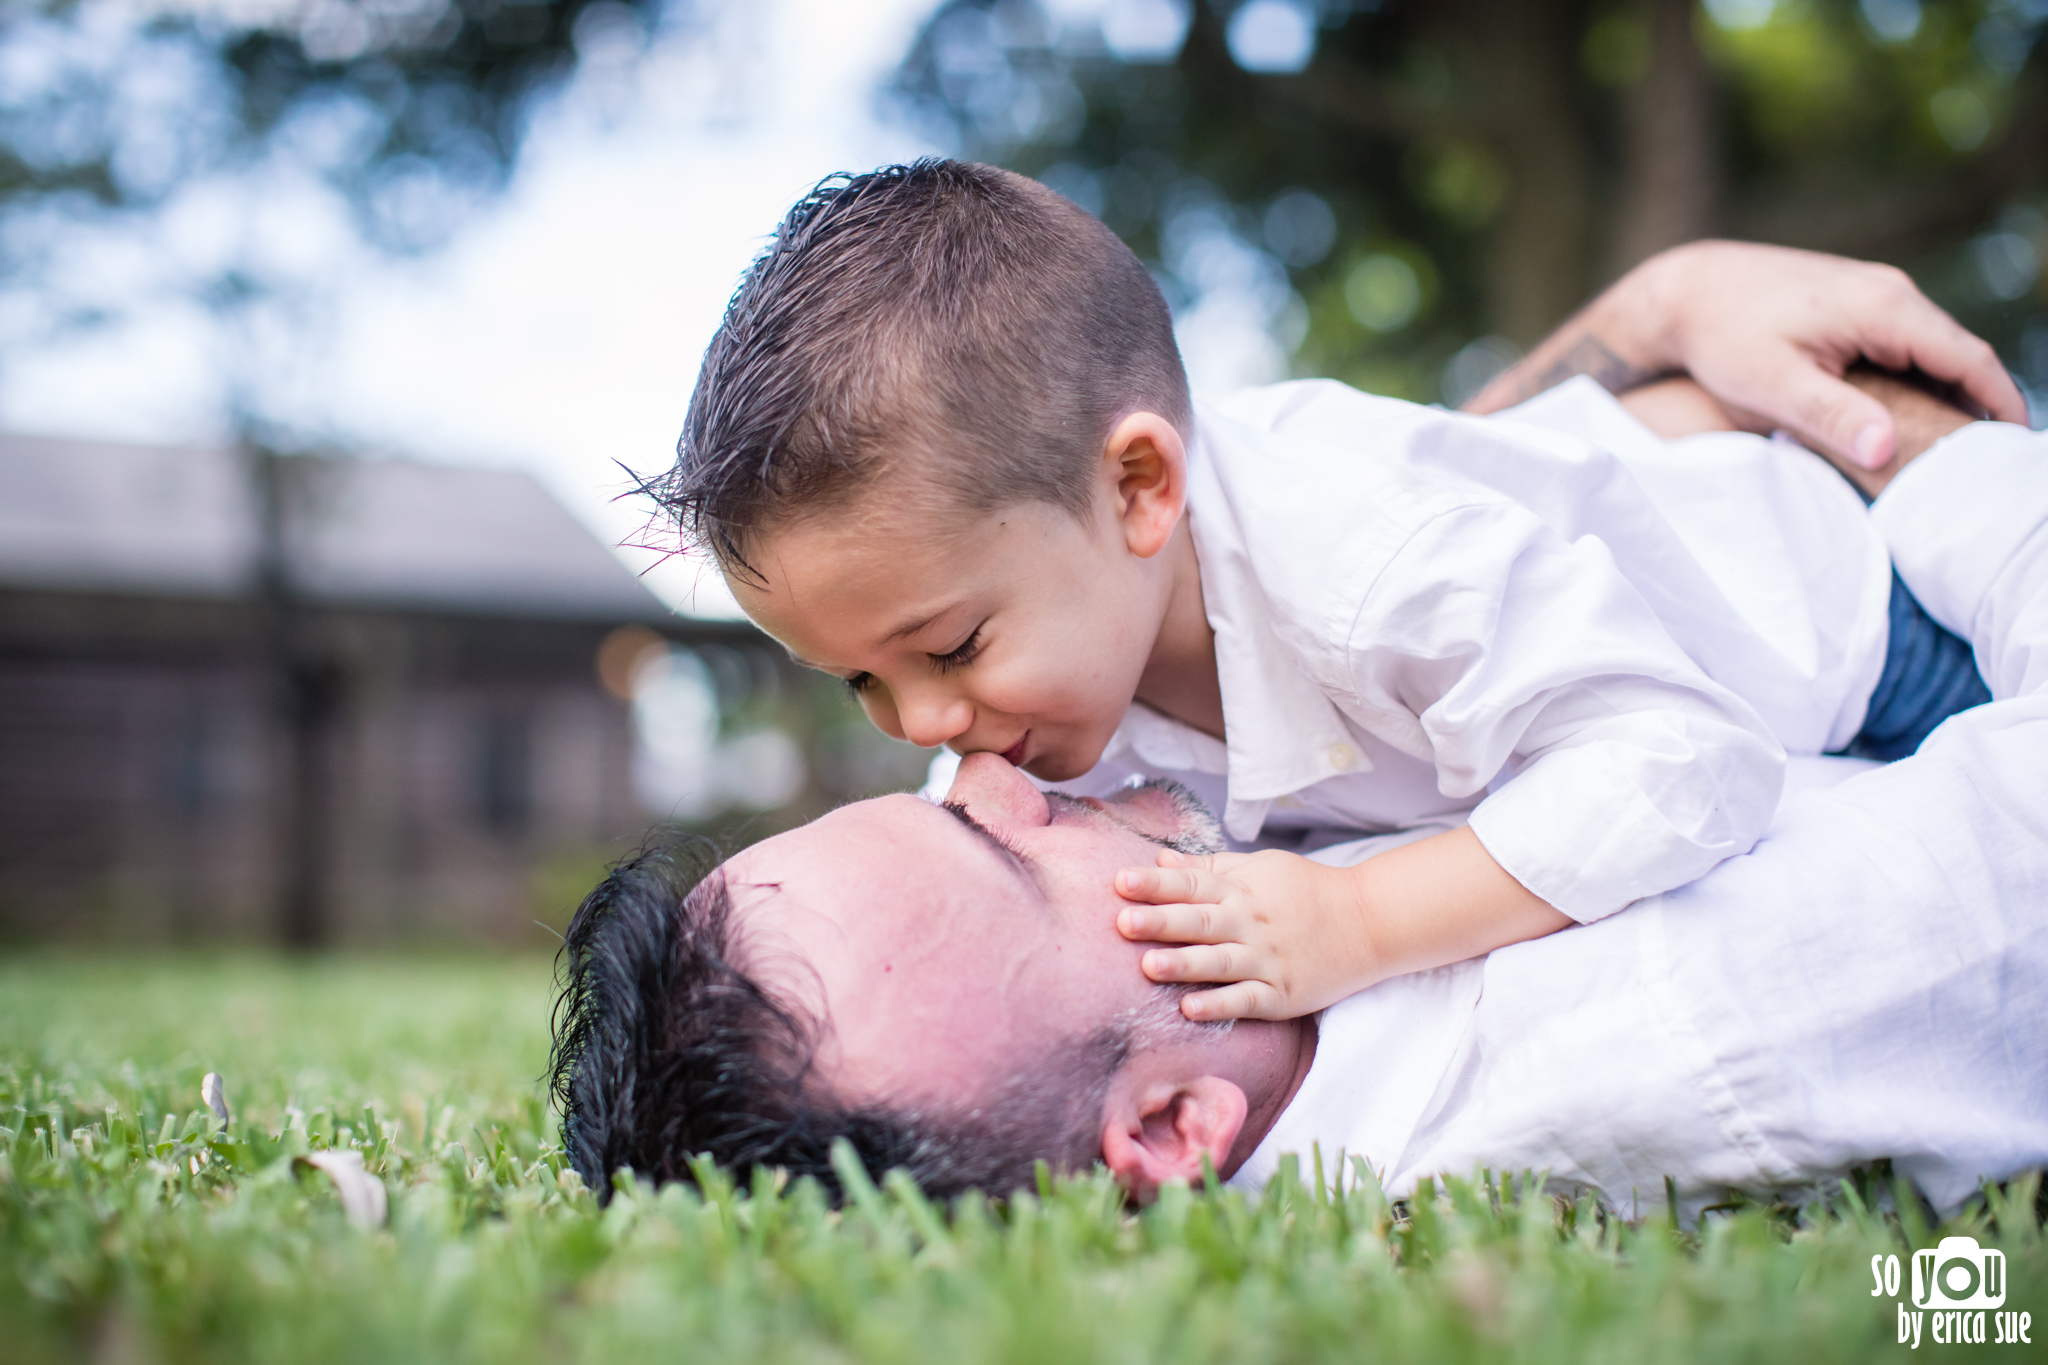 so-you-by-erica-sue-davie-maternity-photographer-fl-7092.jpg